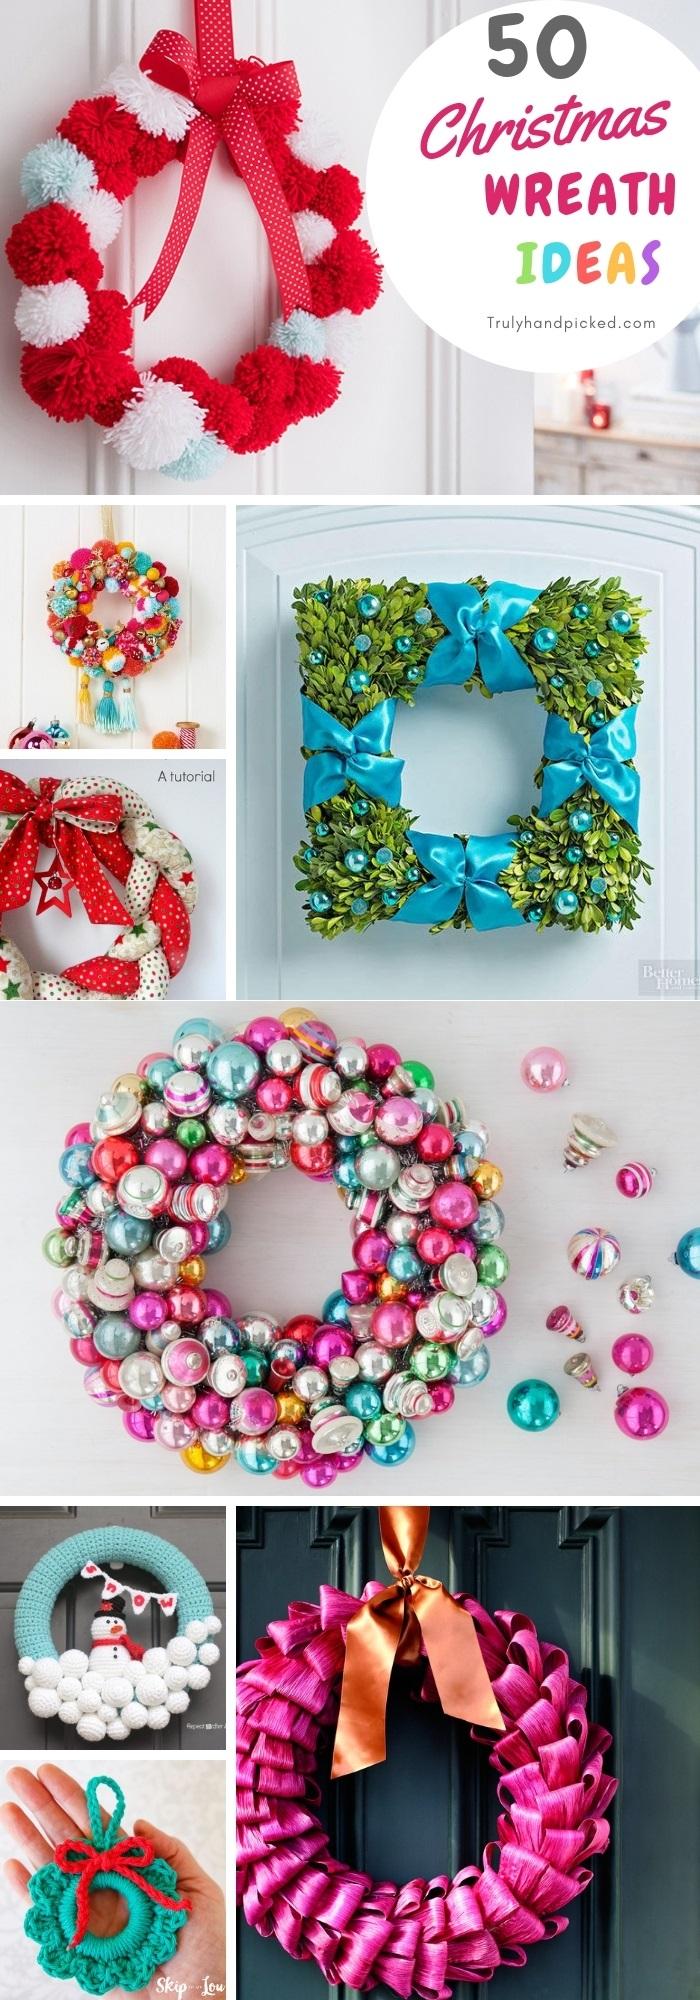 50 Diy Christmas Wreath Ideas Warm Sweet N Inexpensive Wreaths